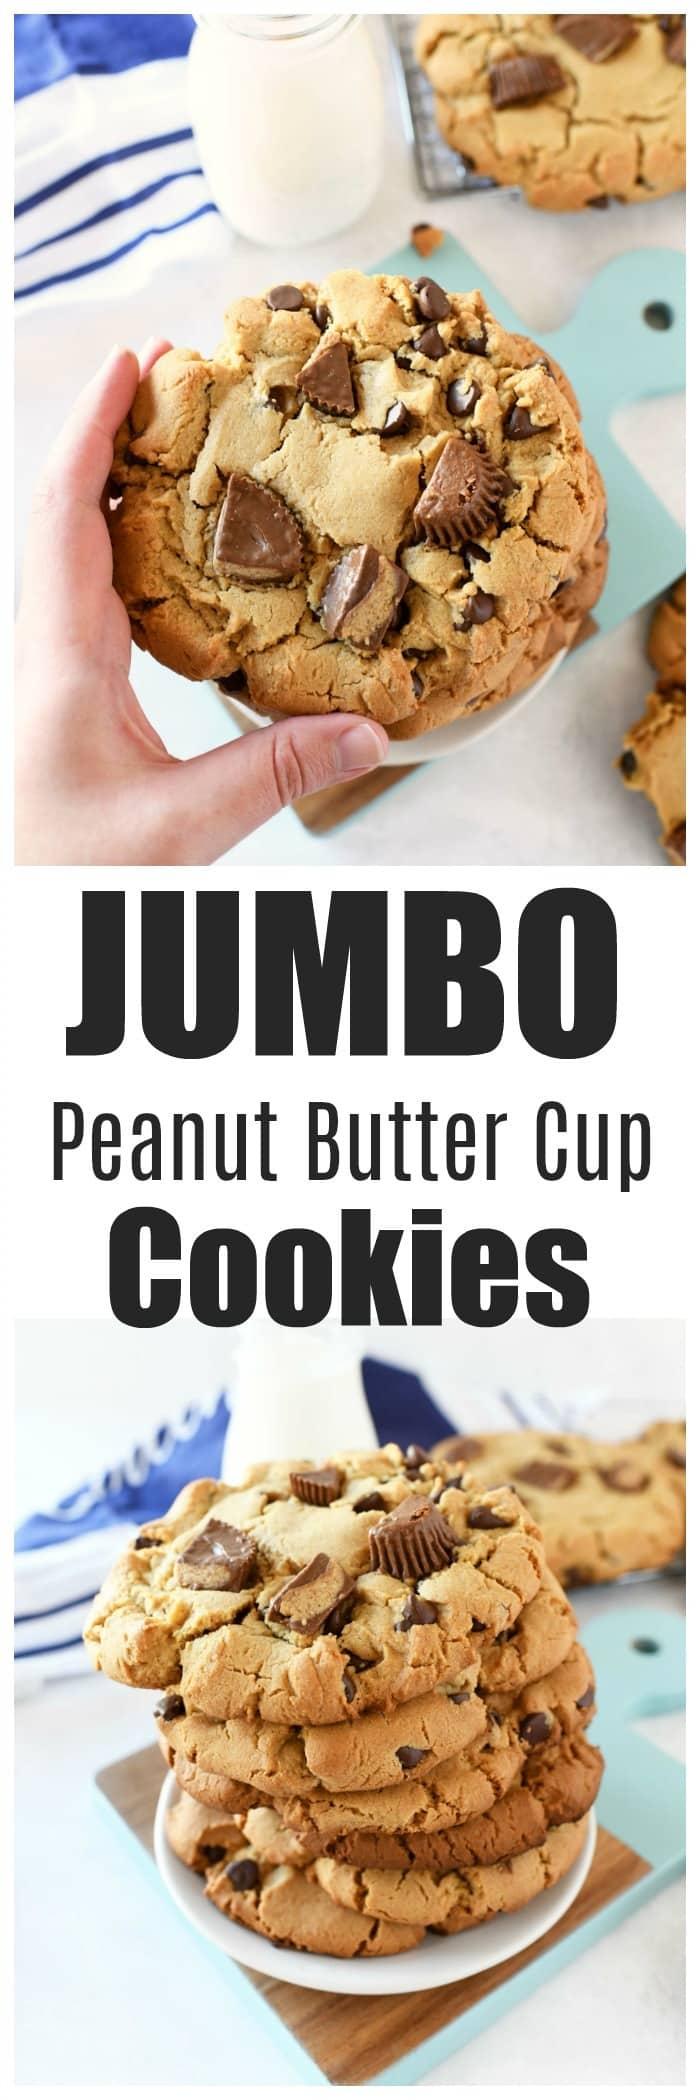 JUMBO Peanut Butter Cup Cookies